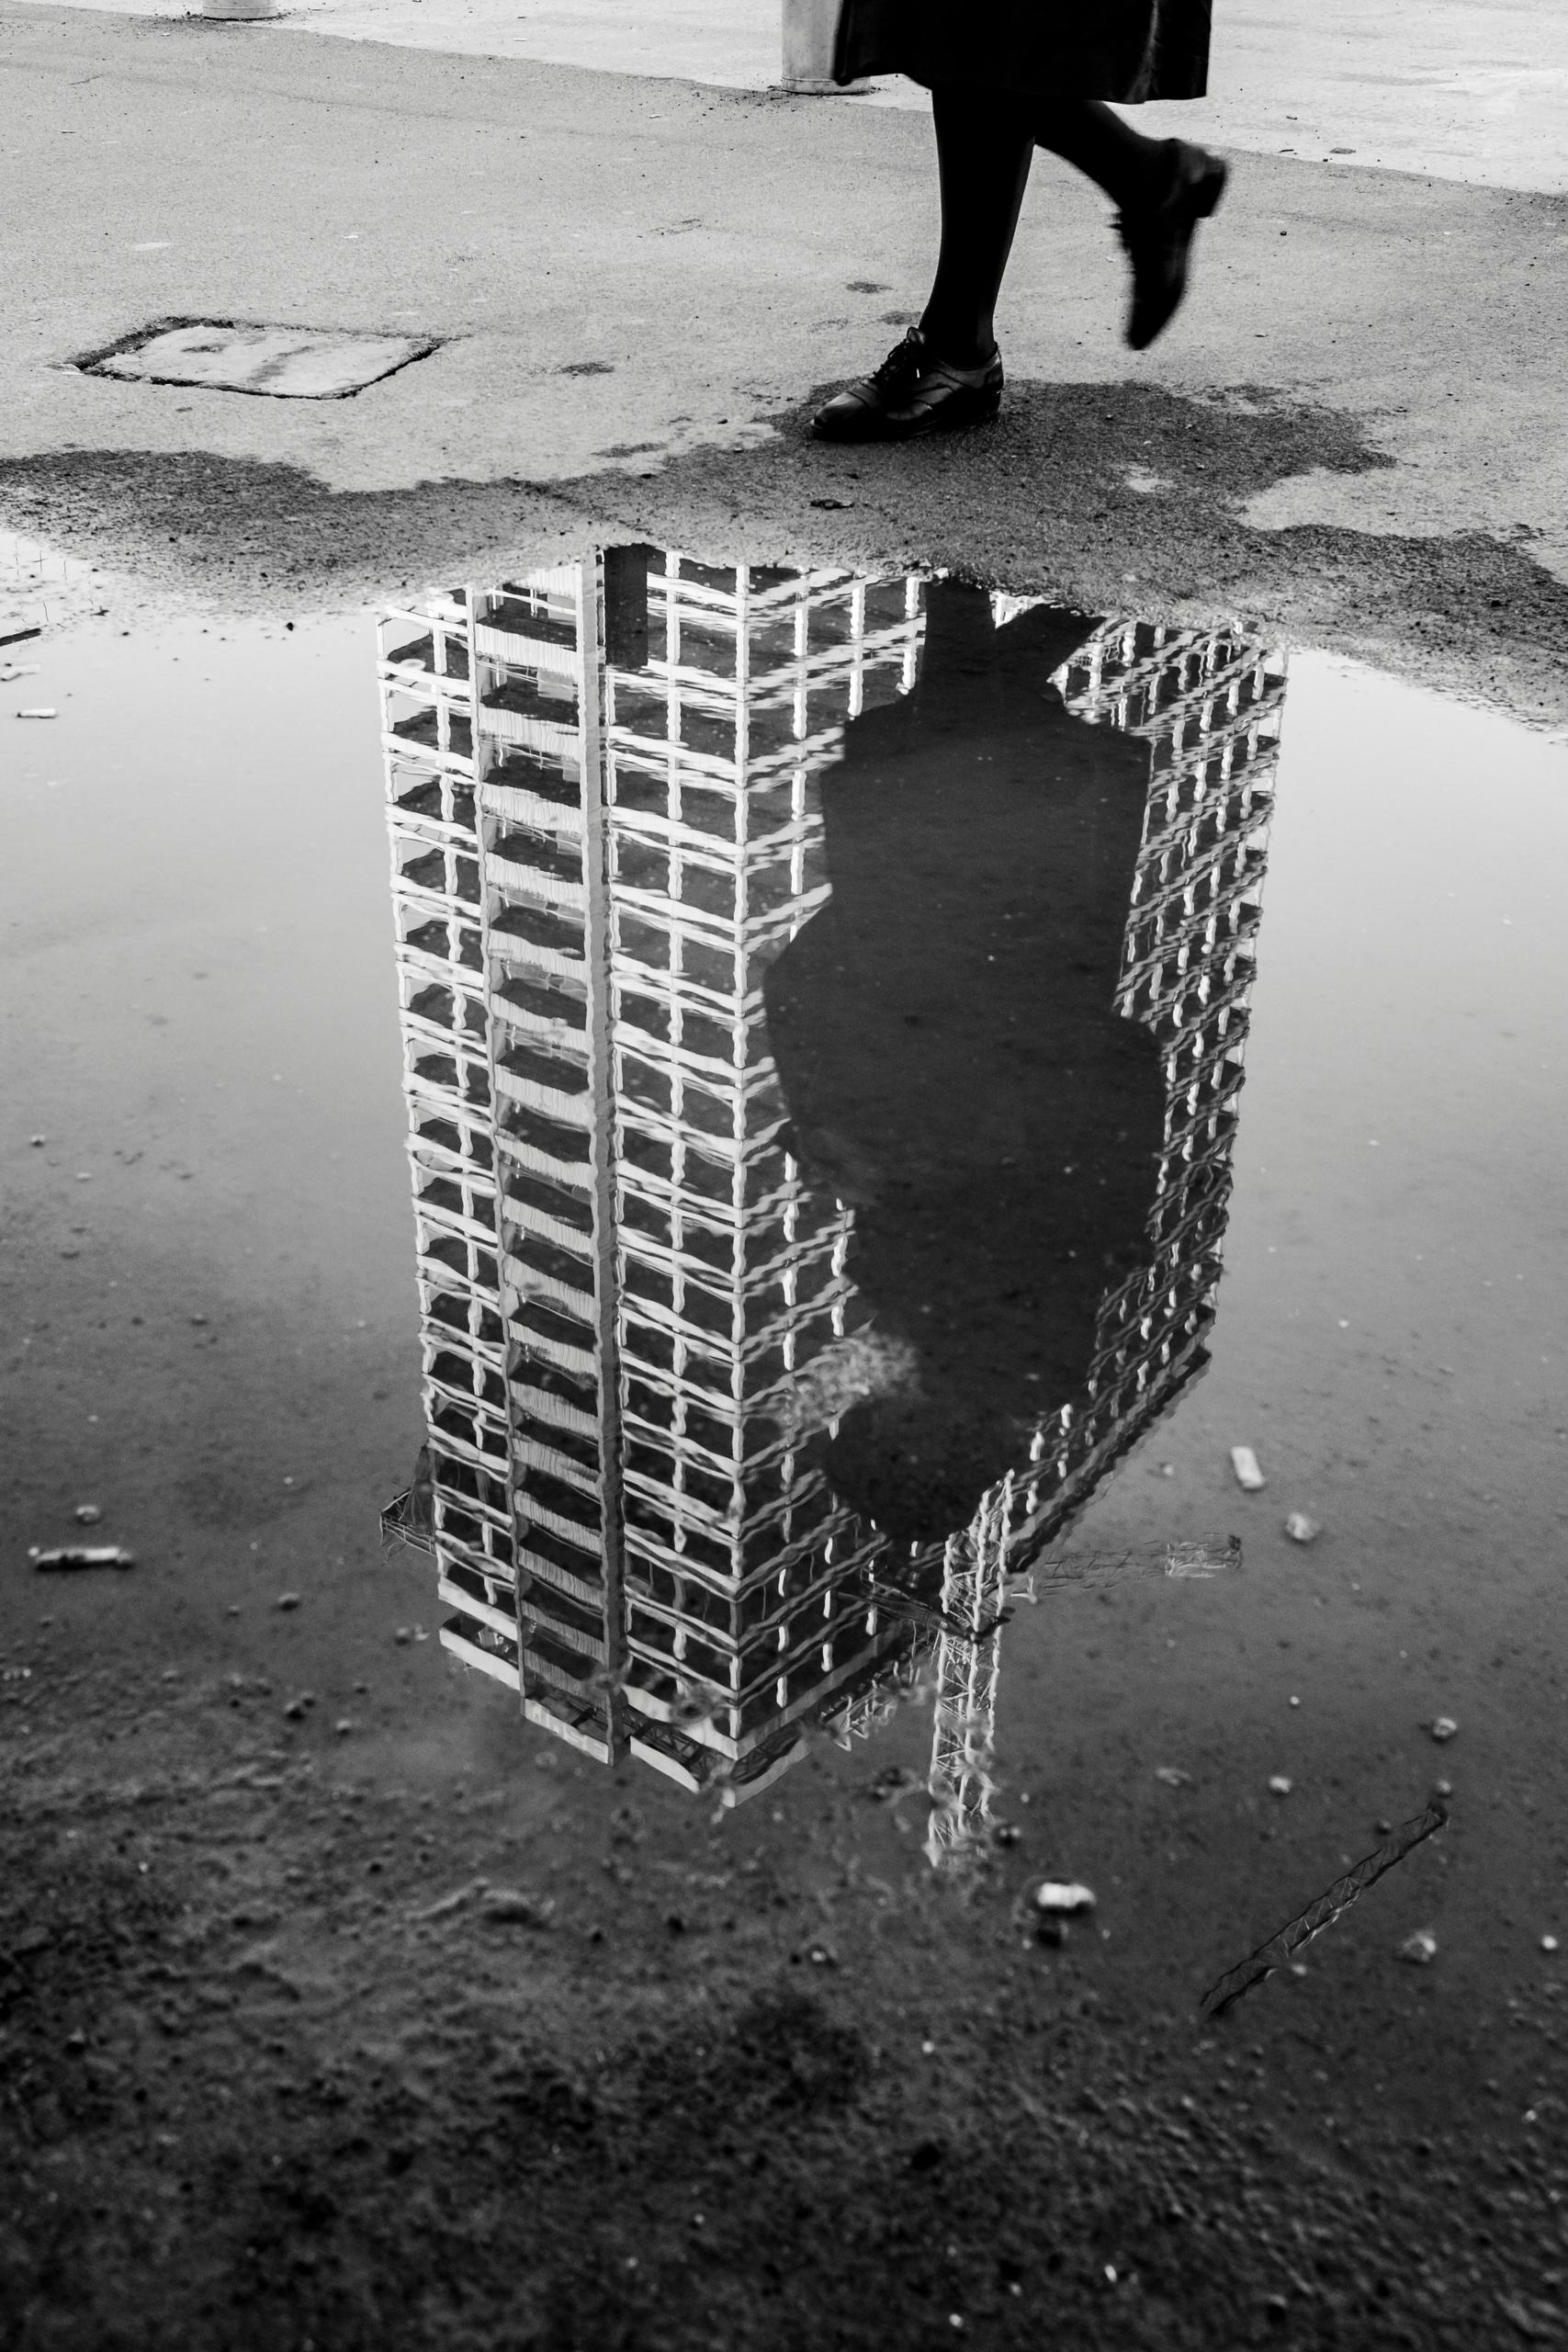 Puddles buildings - streetphotography - jinghels | ello